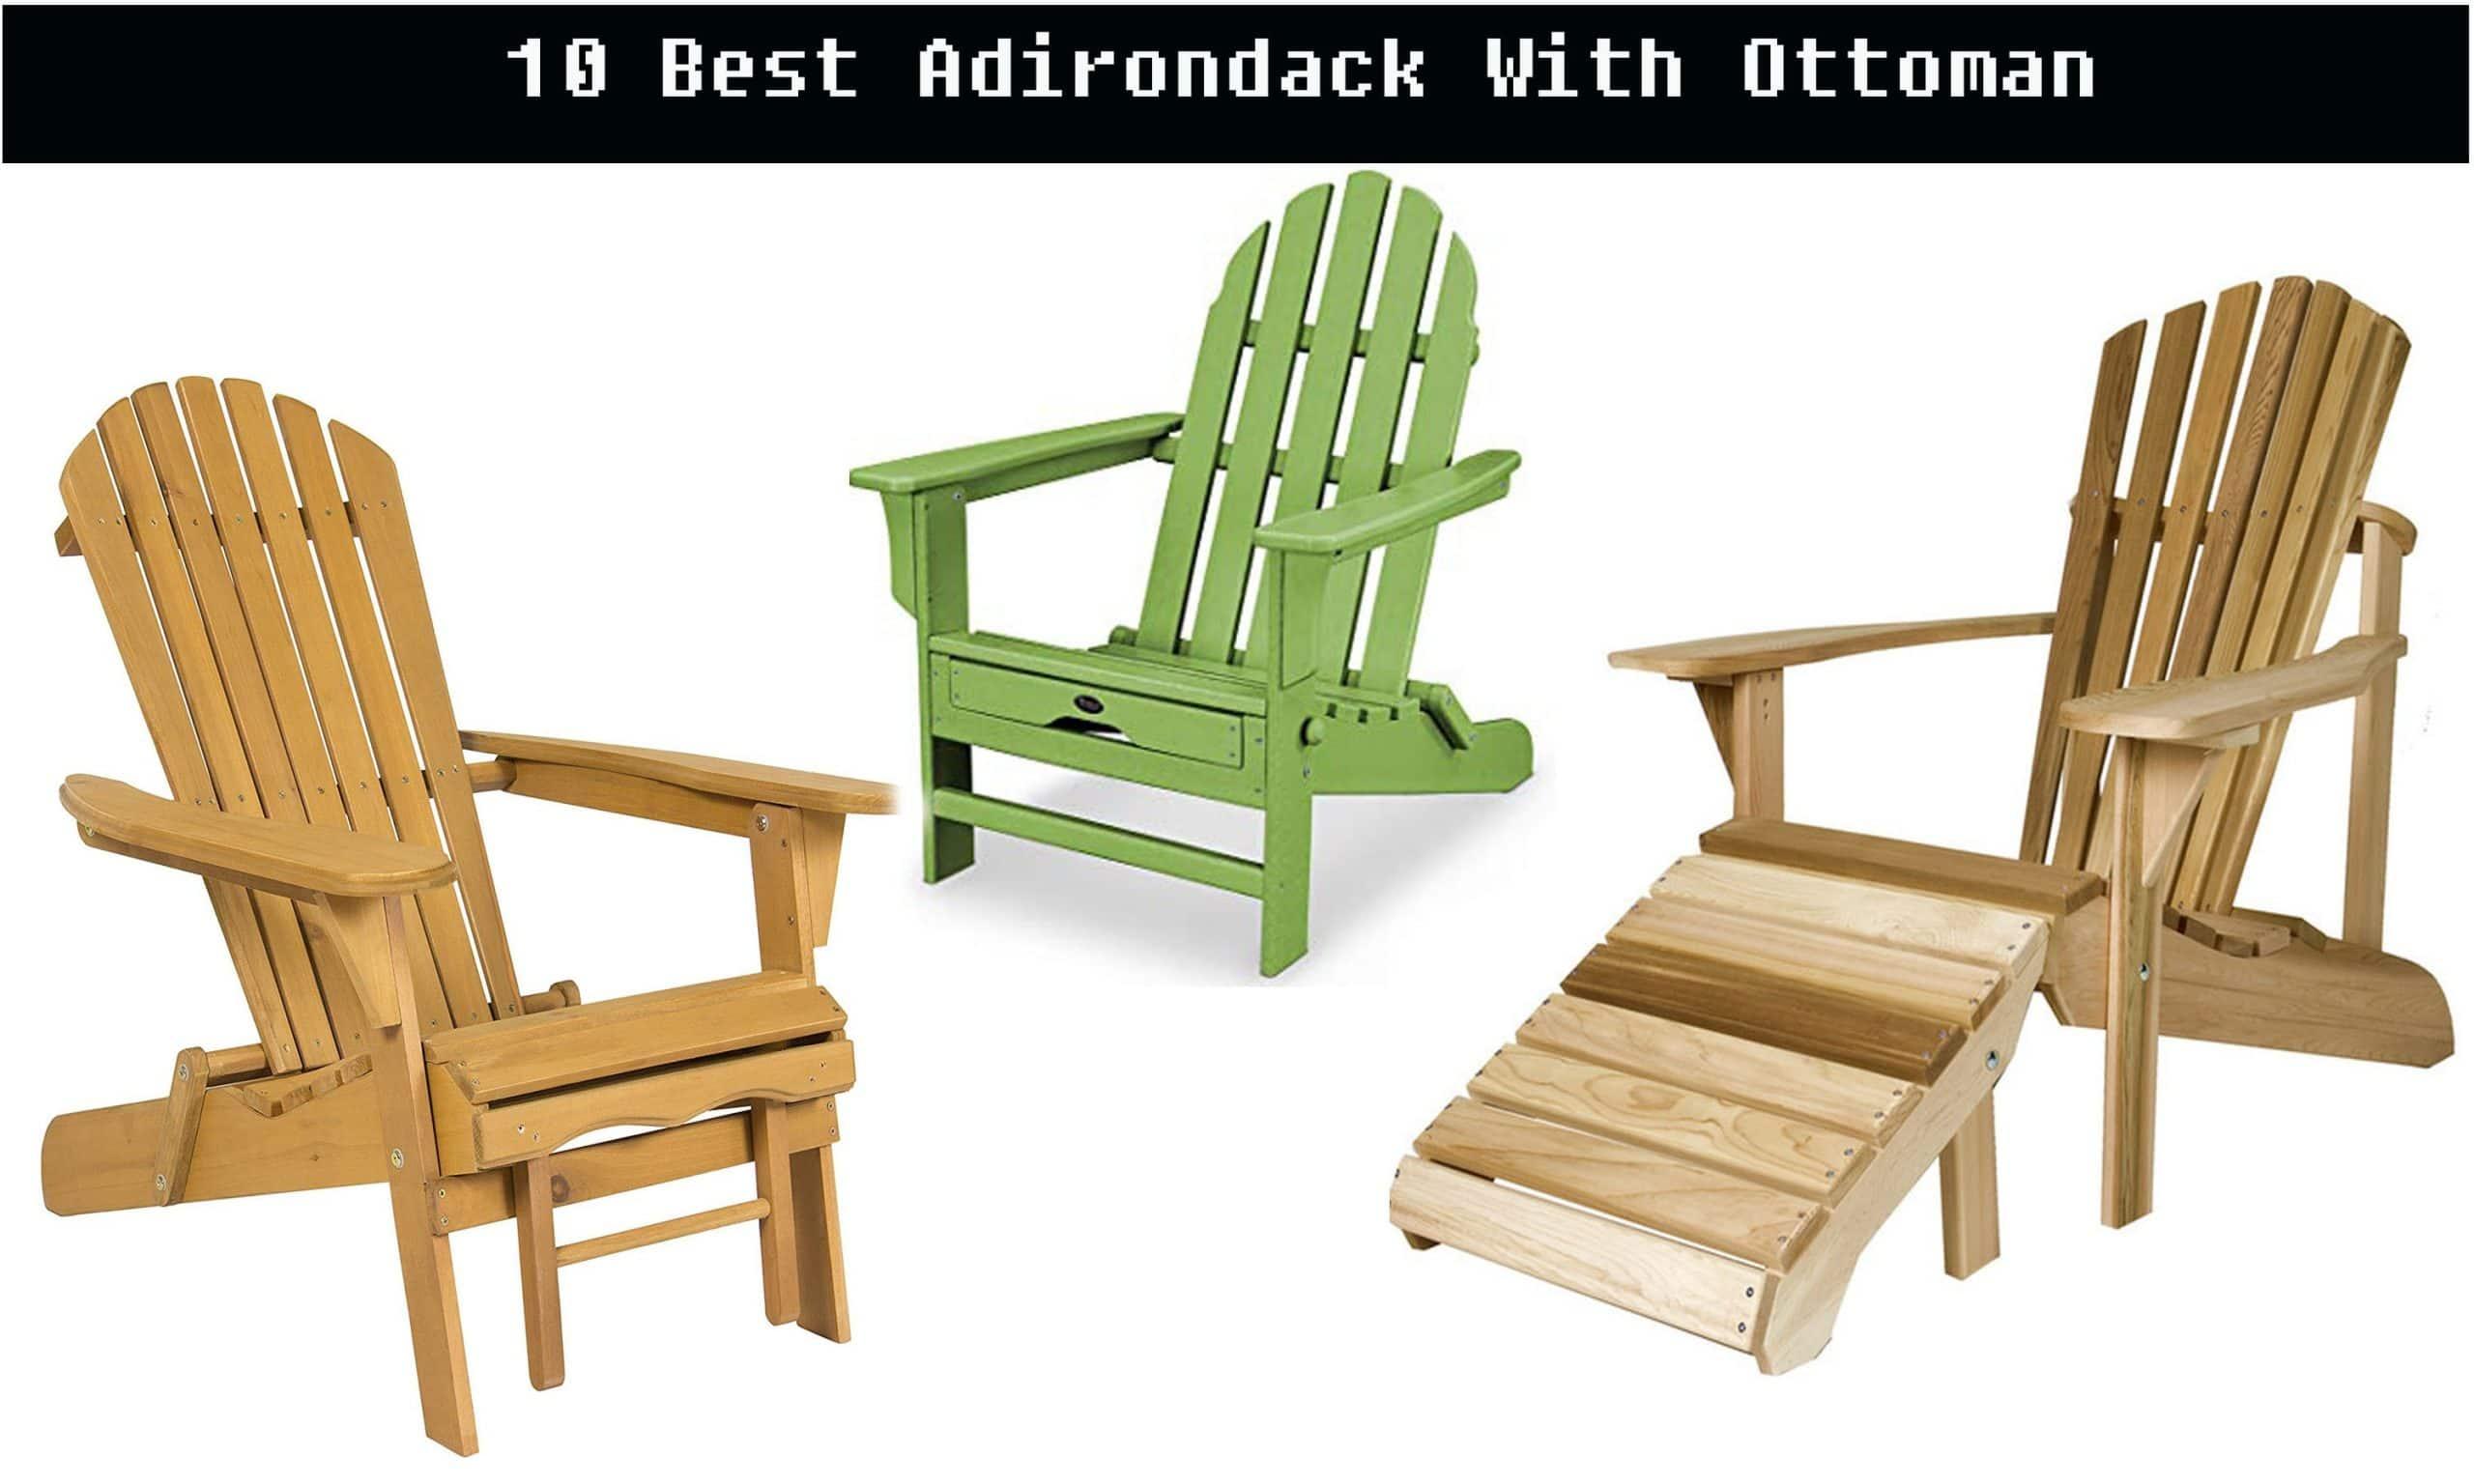 ottoman for adirondack chair